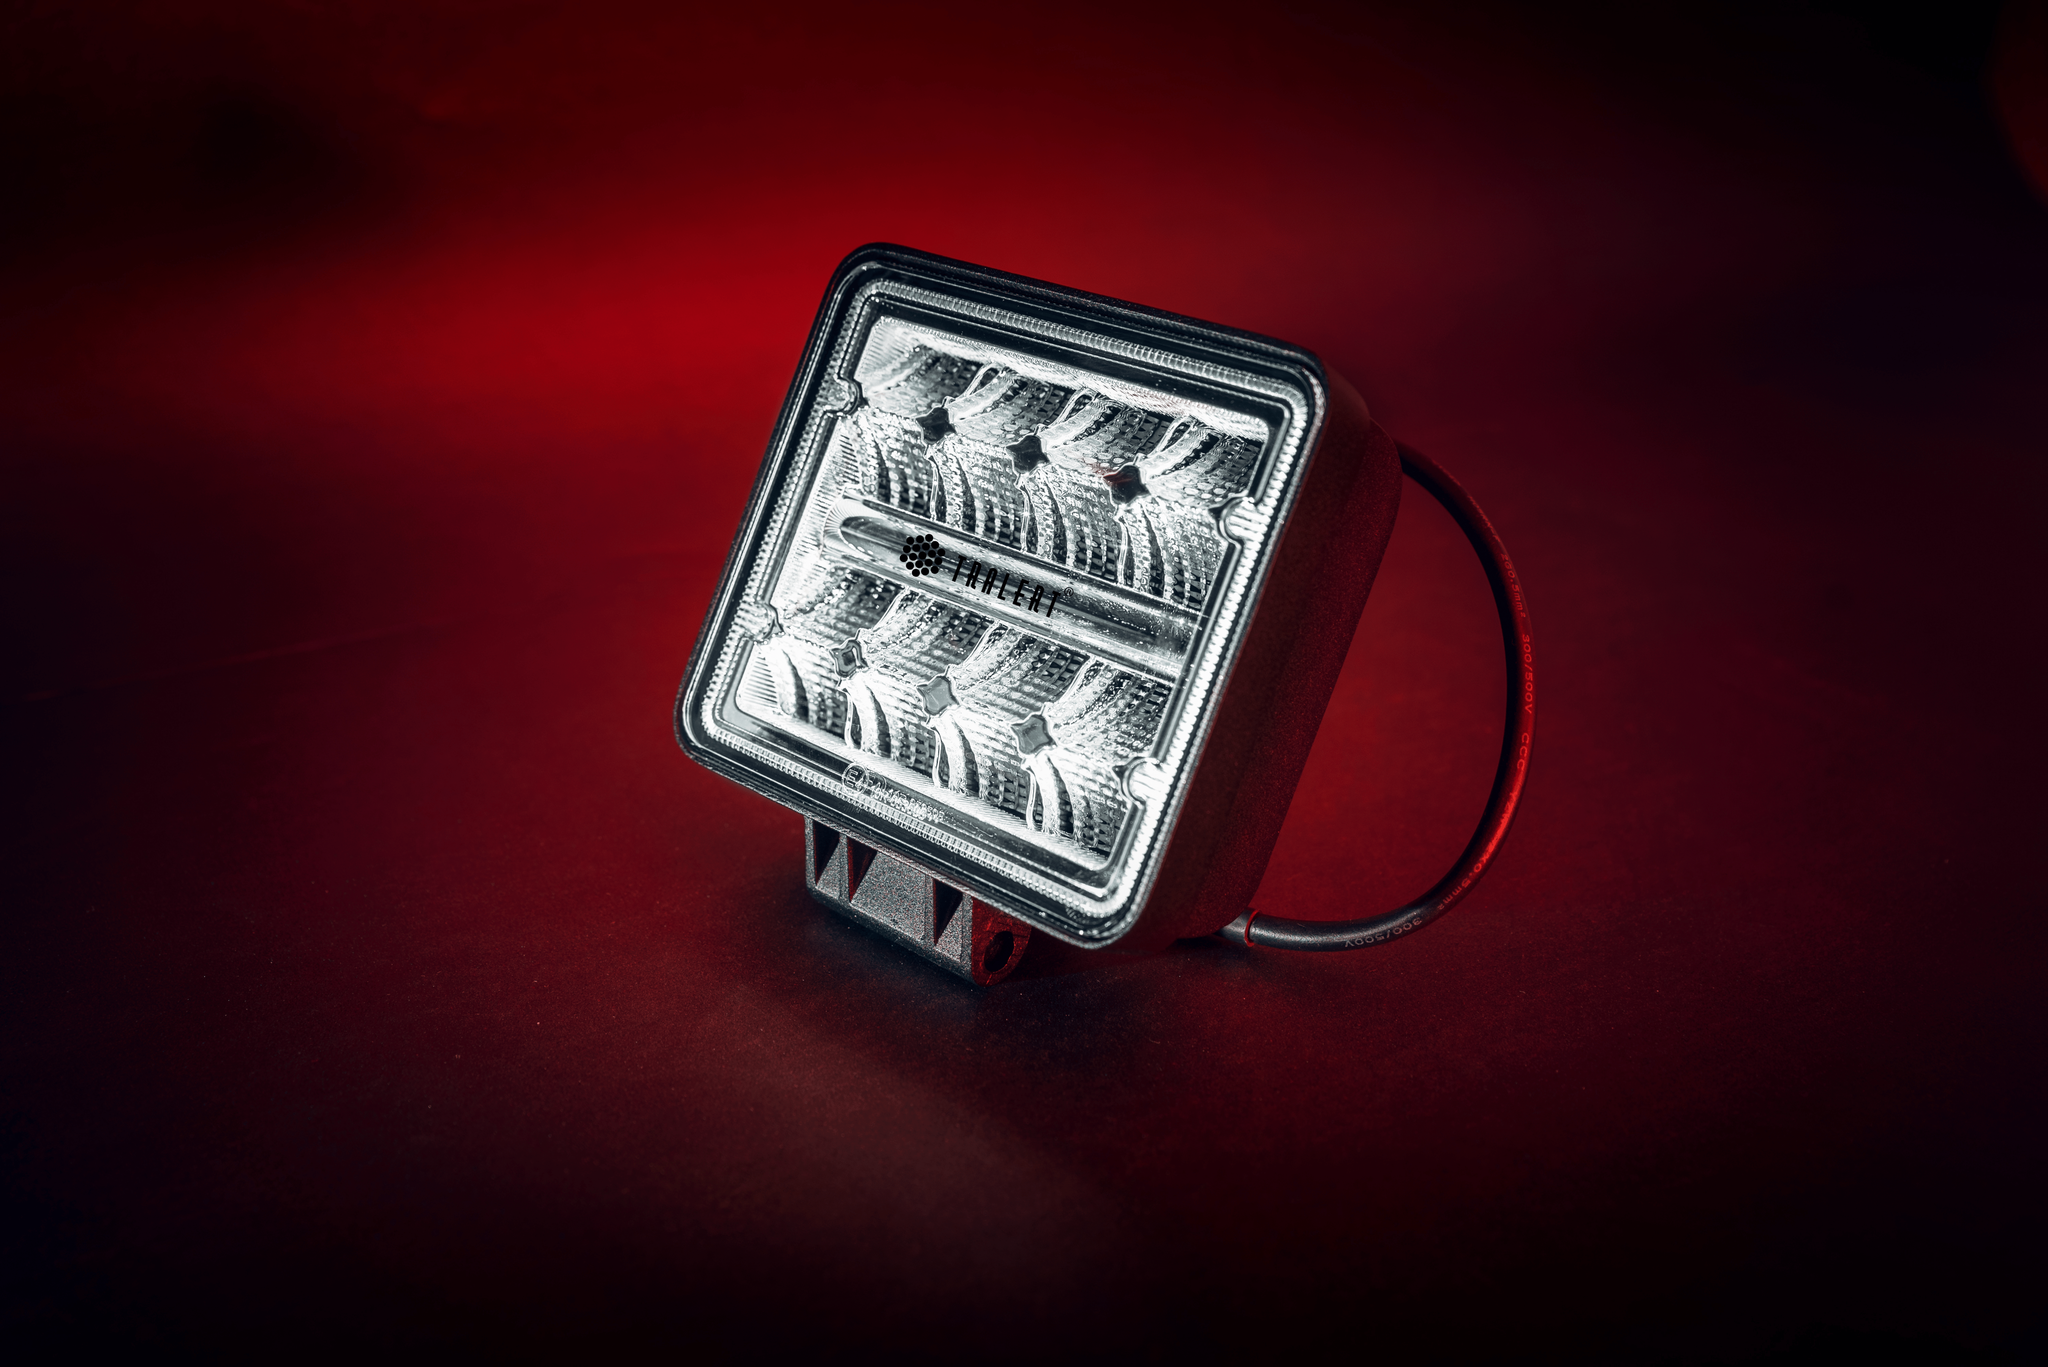 LED SAE werklamp met RFT